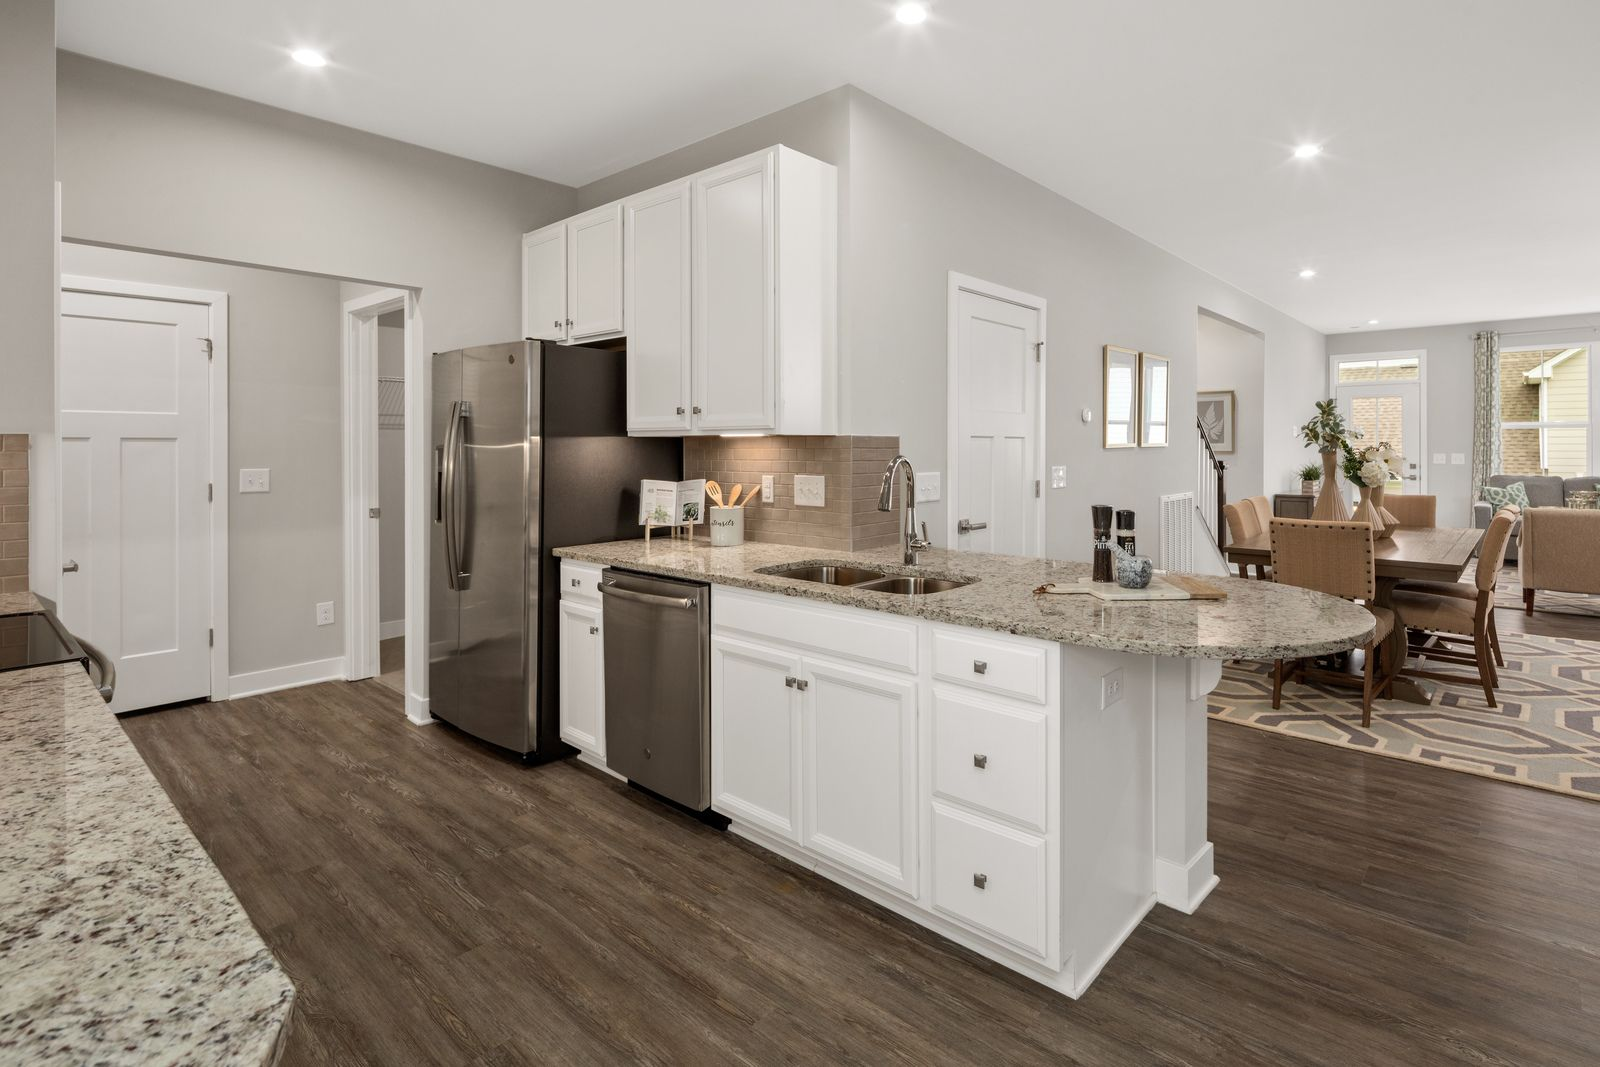 Kitchen featured in the Calvert By Ryan Homes in Cincinnati, OH